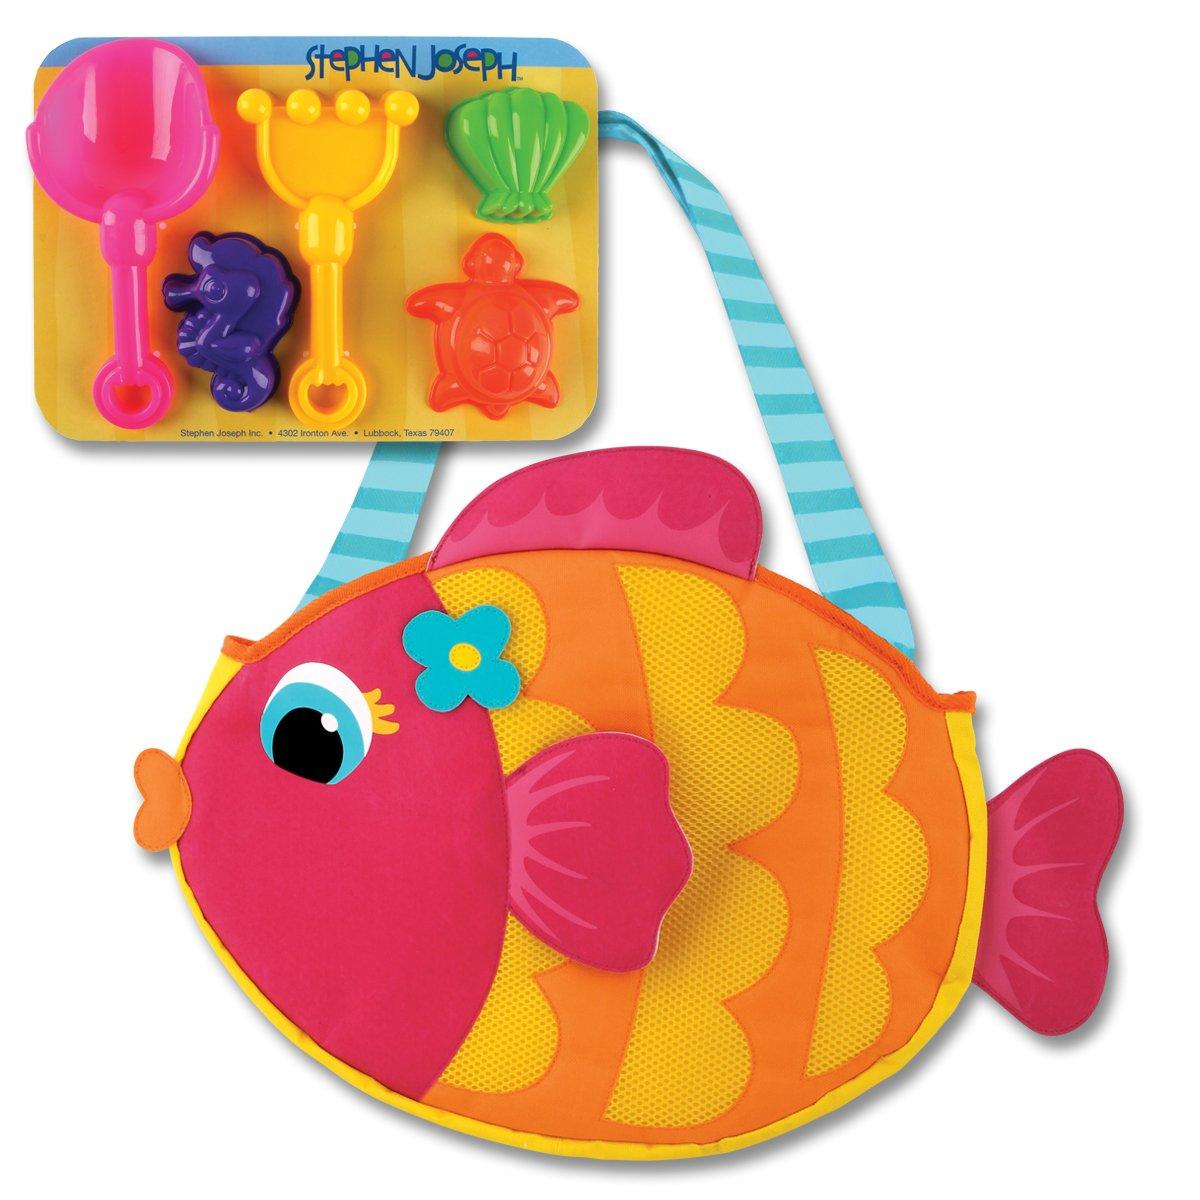 Amazon.com: Stephen Joseph Beach Tote, Fish: Aldo Nova: Toys & Games